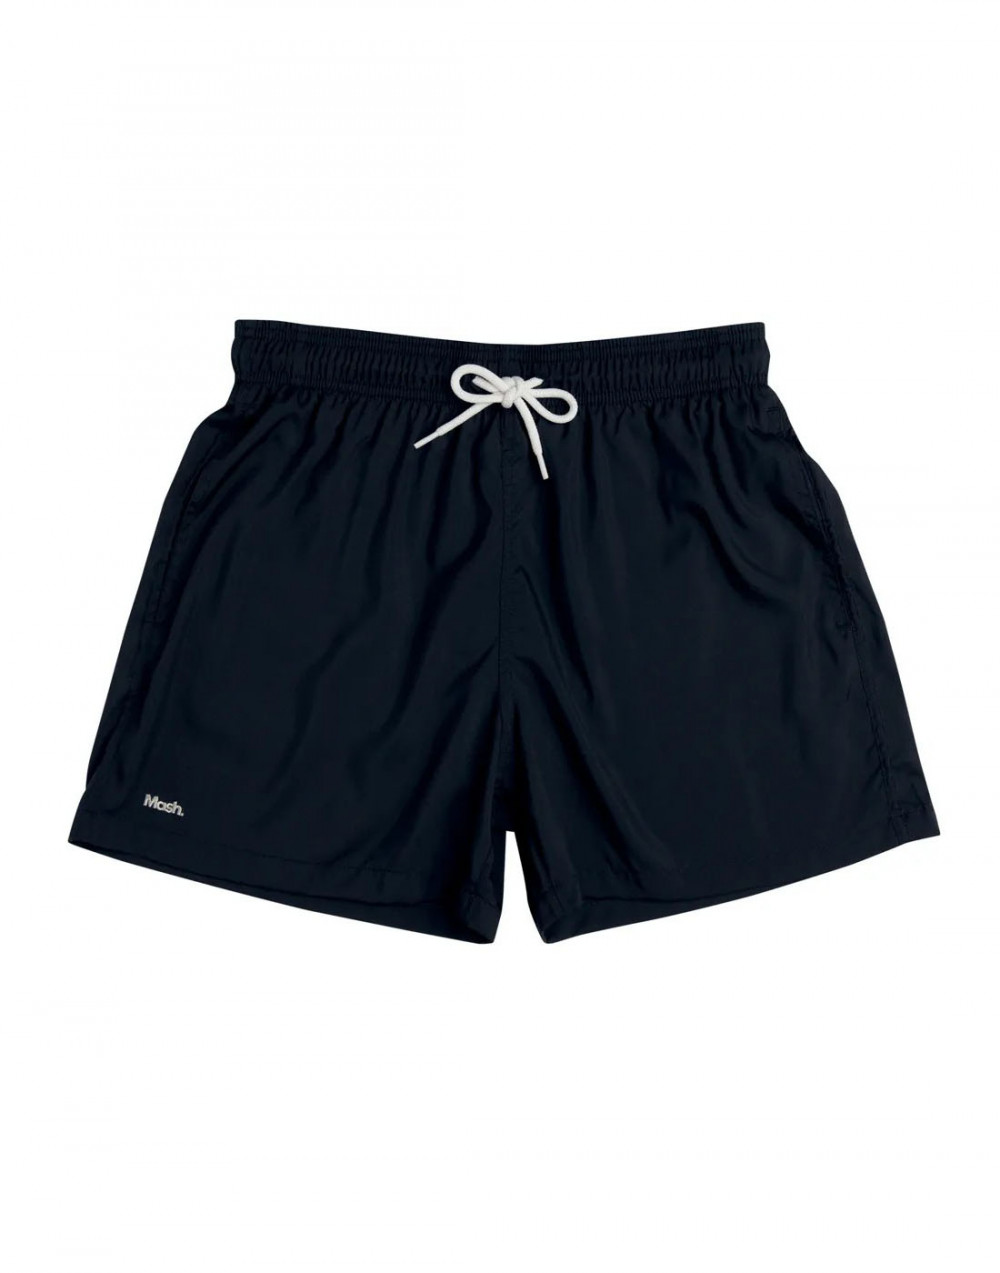 Shorts Praia Curto Liso Preto Mash